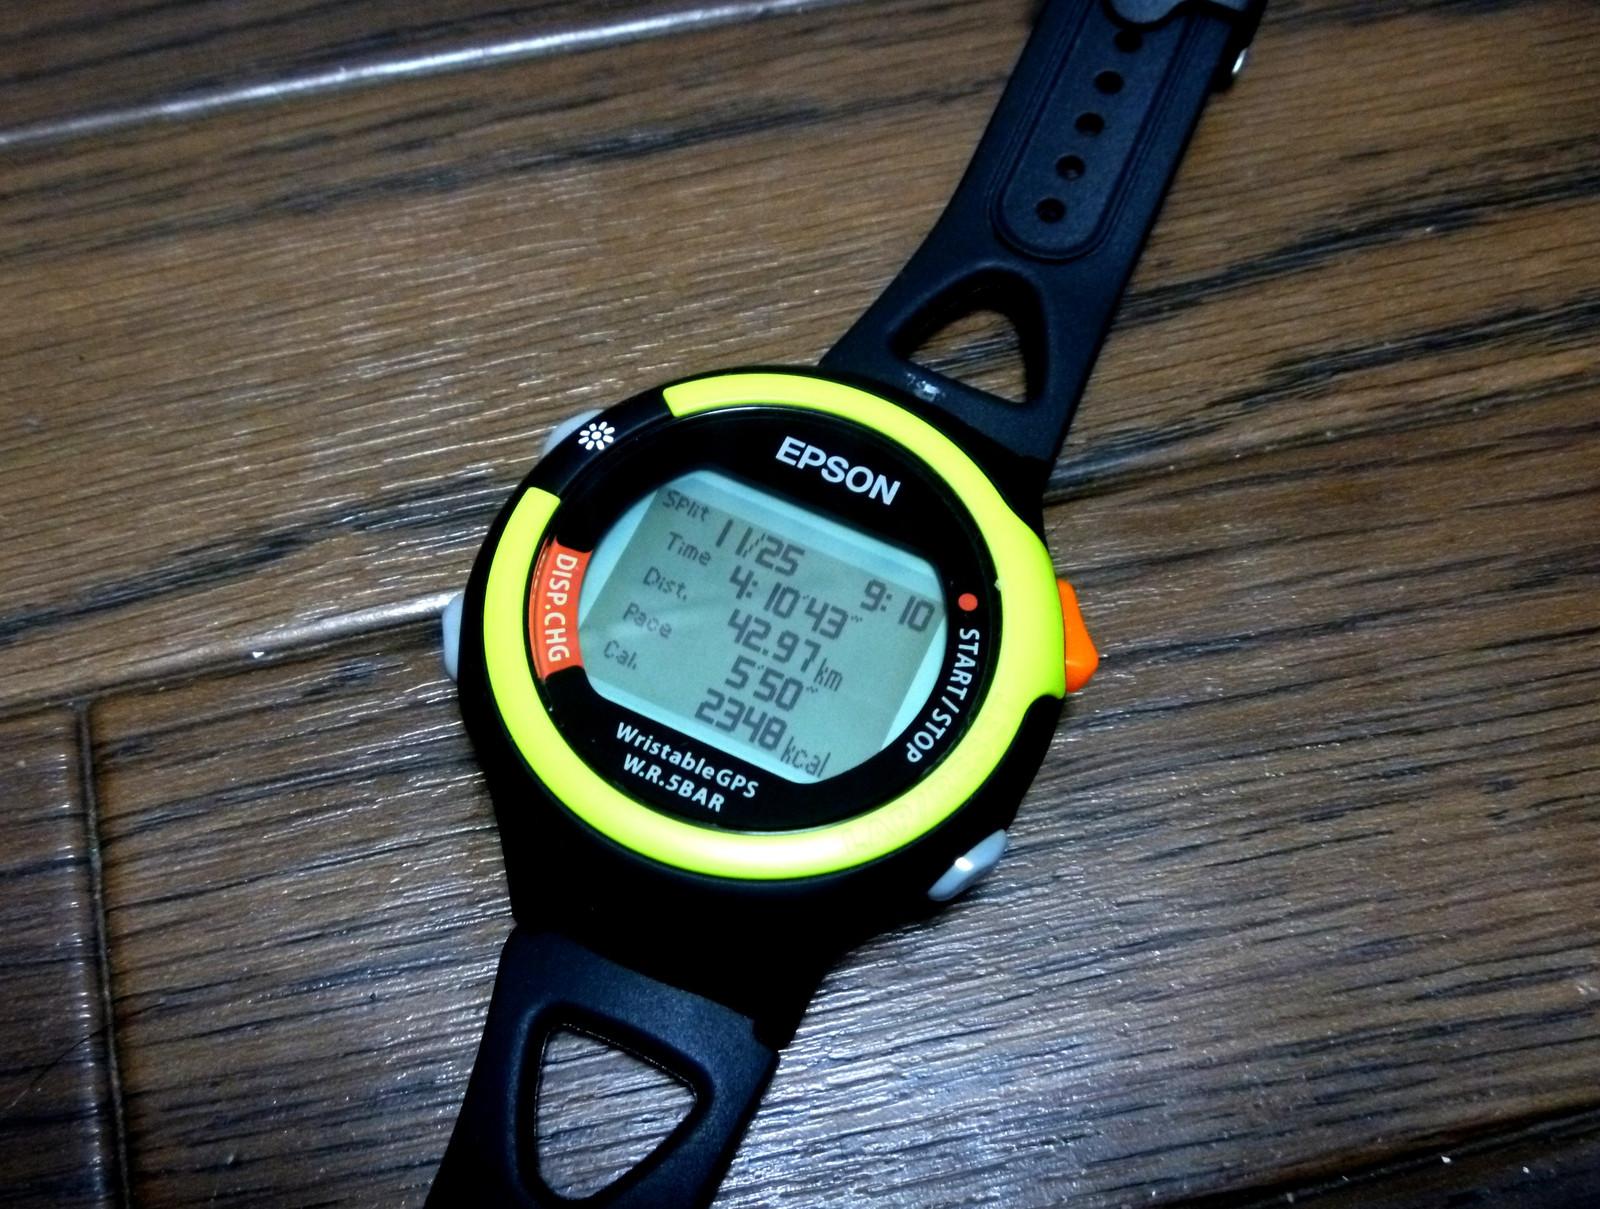 GPS付の時計があります。山歩きやマラソンで、利用すると便利です!のサムネイル画像